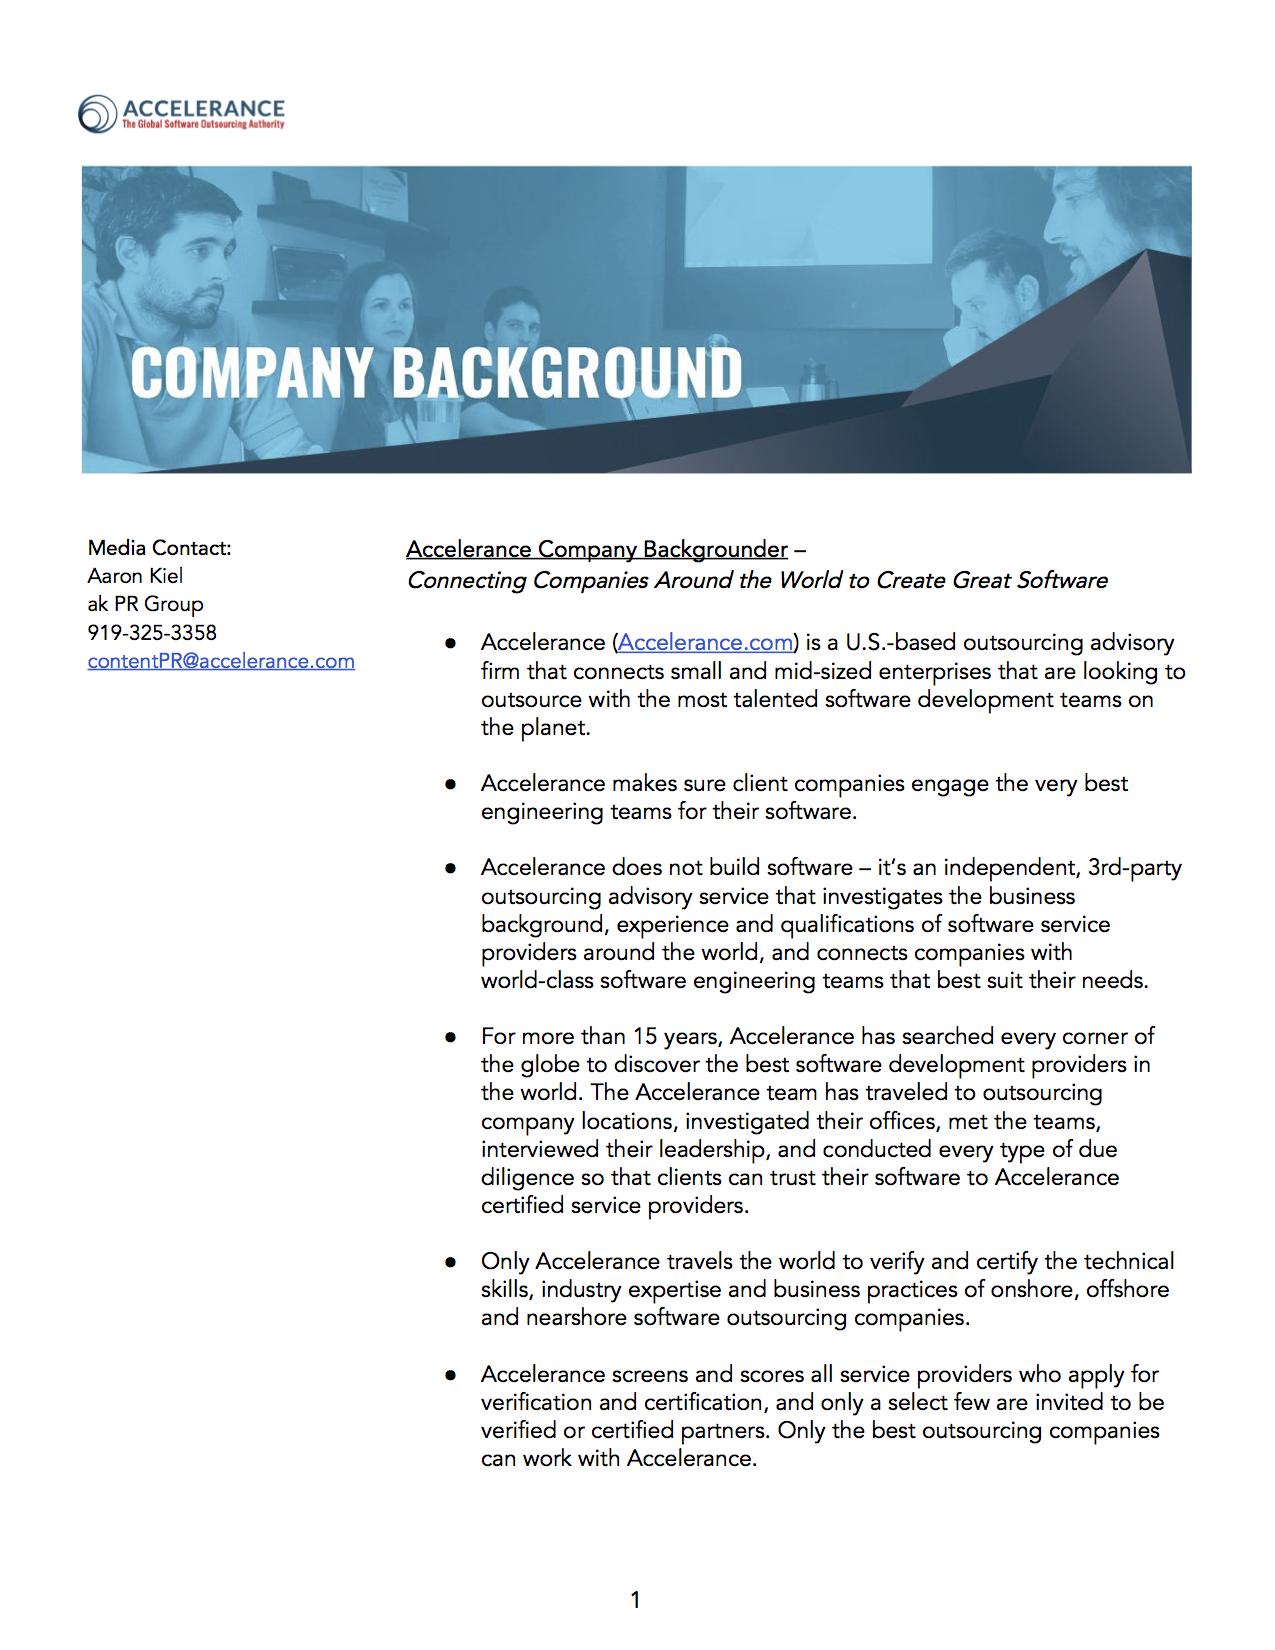 PressKit-CompanyBackground-Accelerance.png